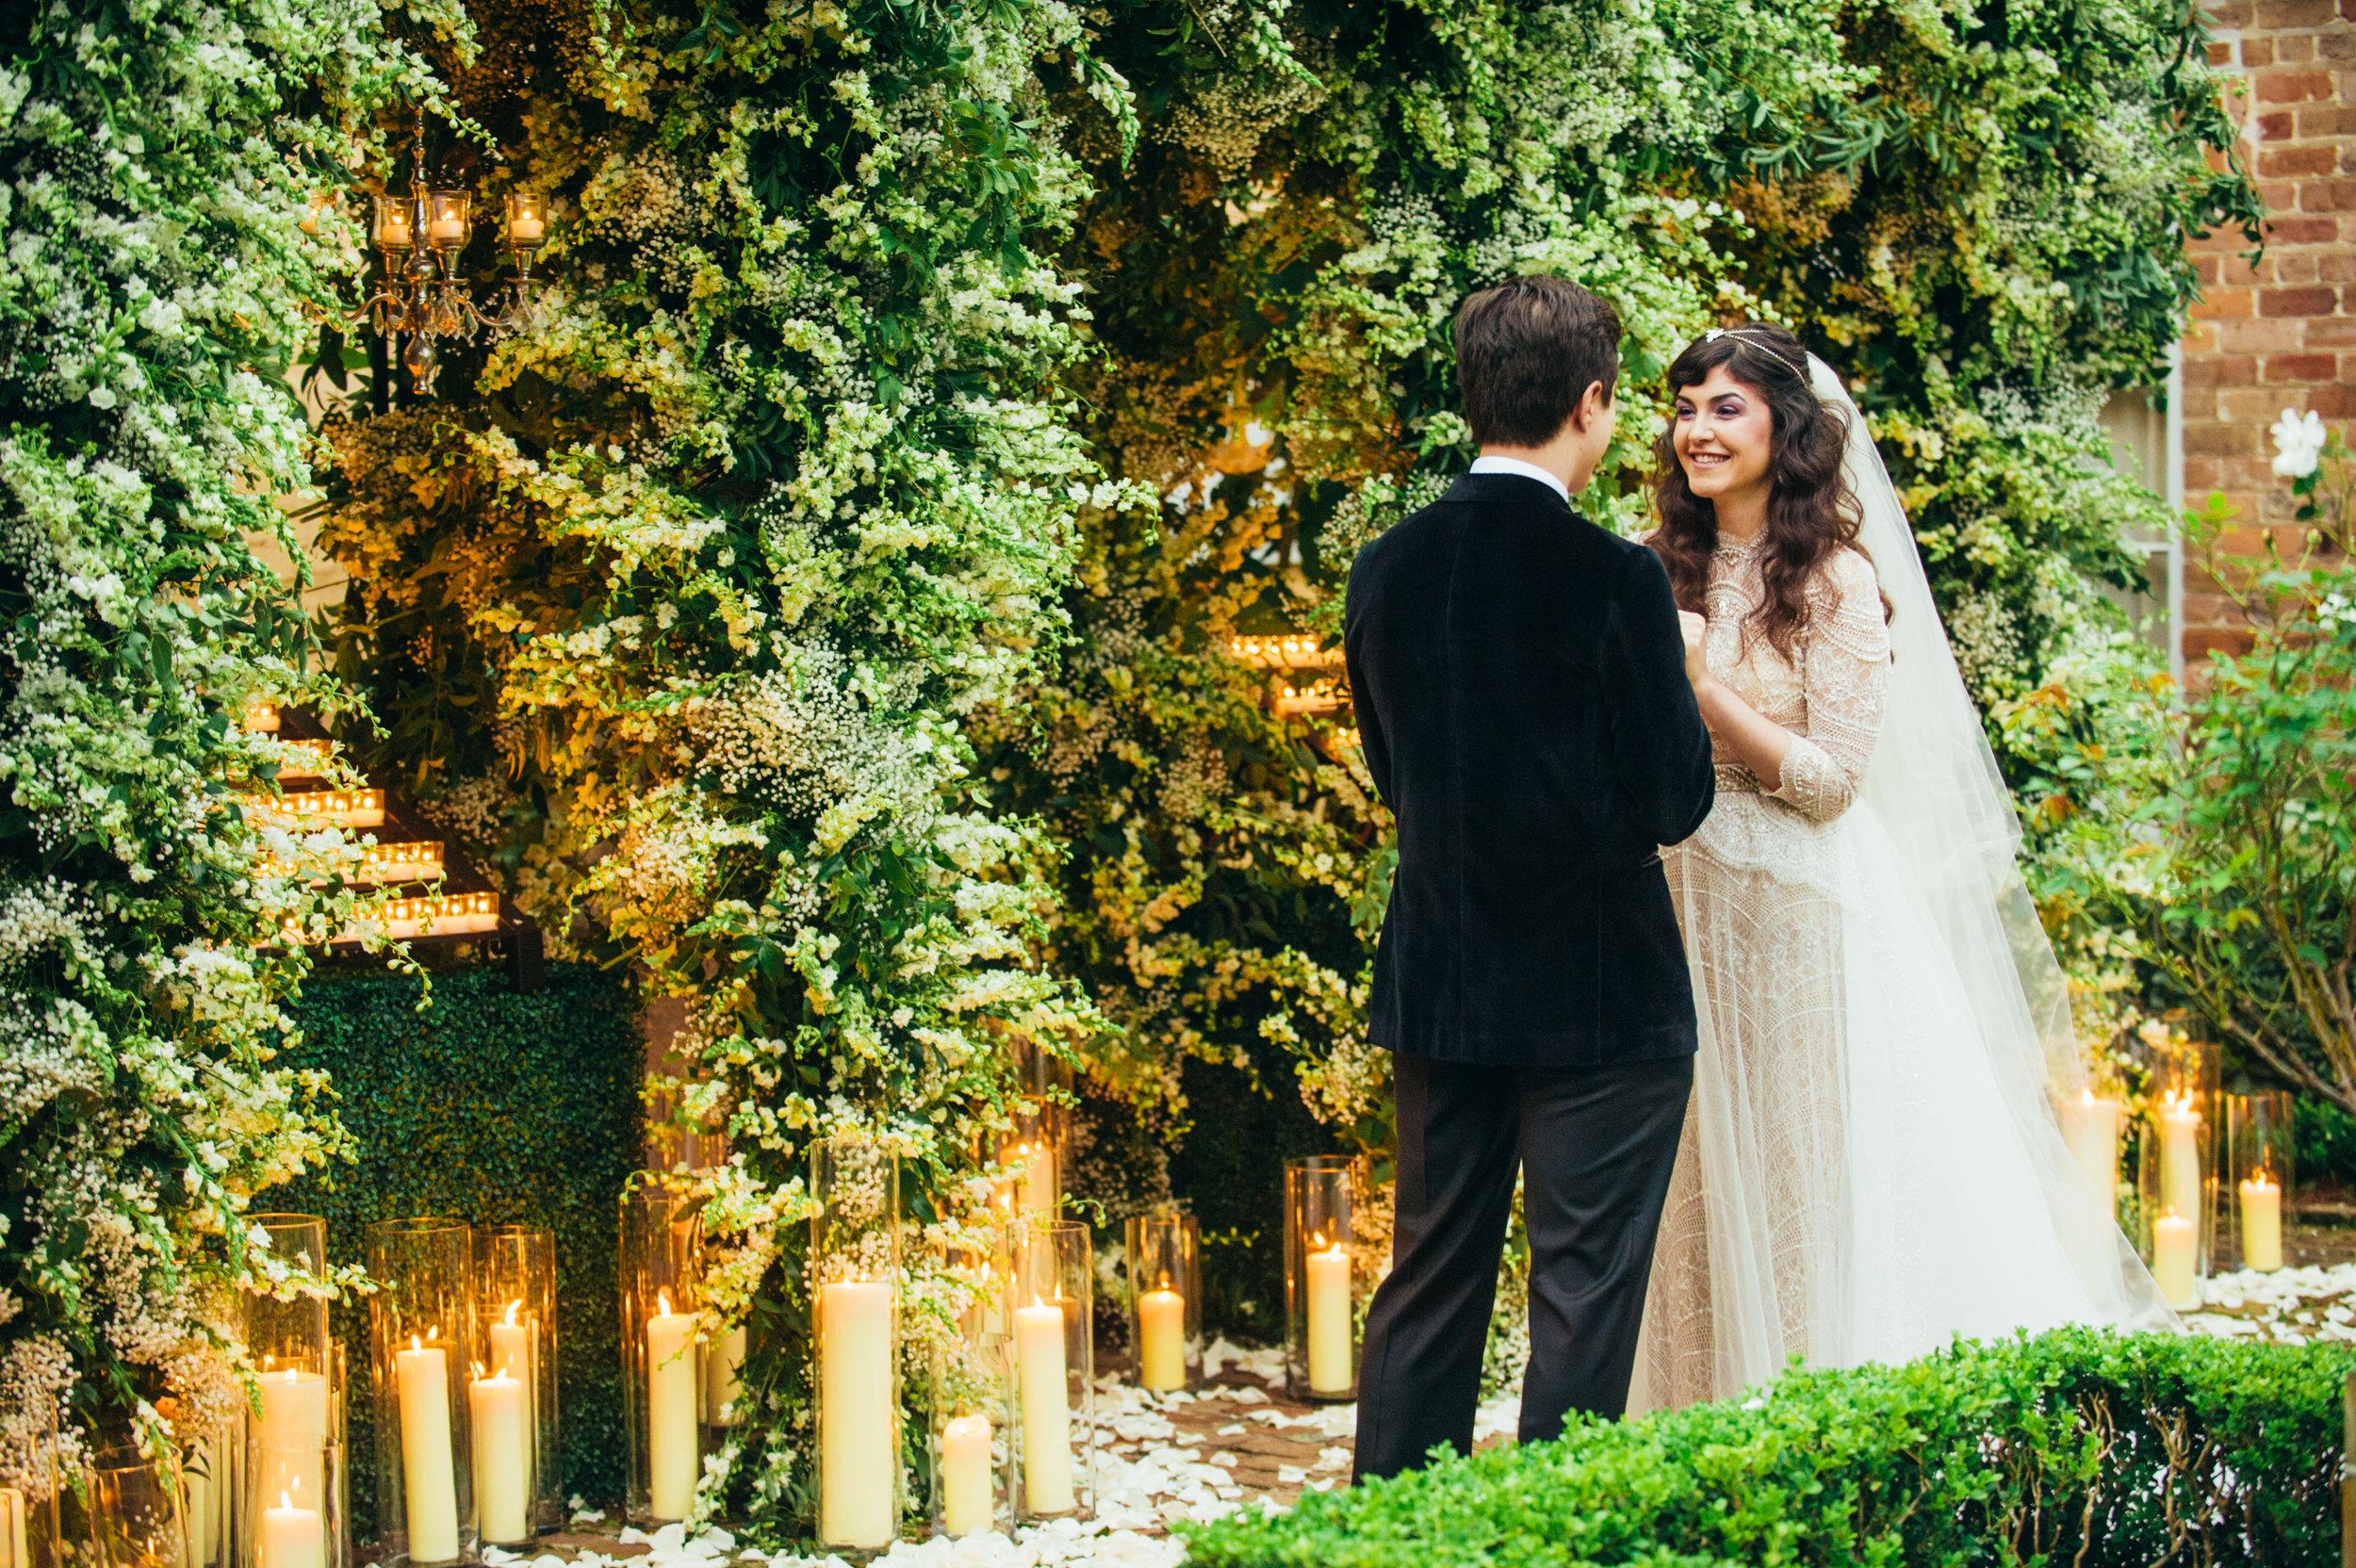 Twilight Inspired Wedding | Larkspur Wedding Flowers | Romantic New Year's Eve Wedding | Sapphire Events